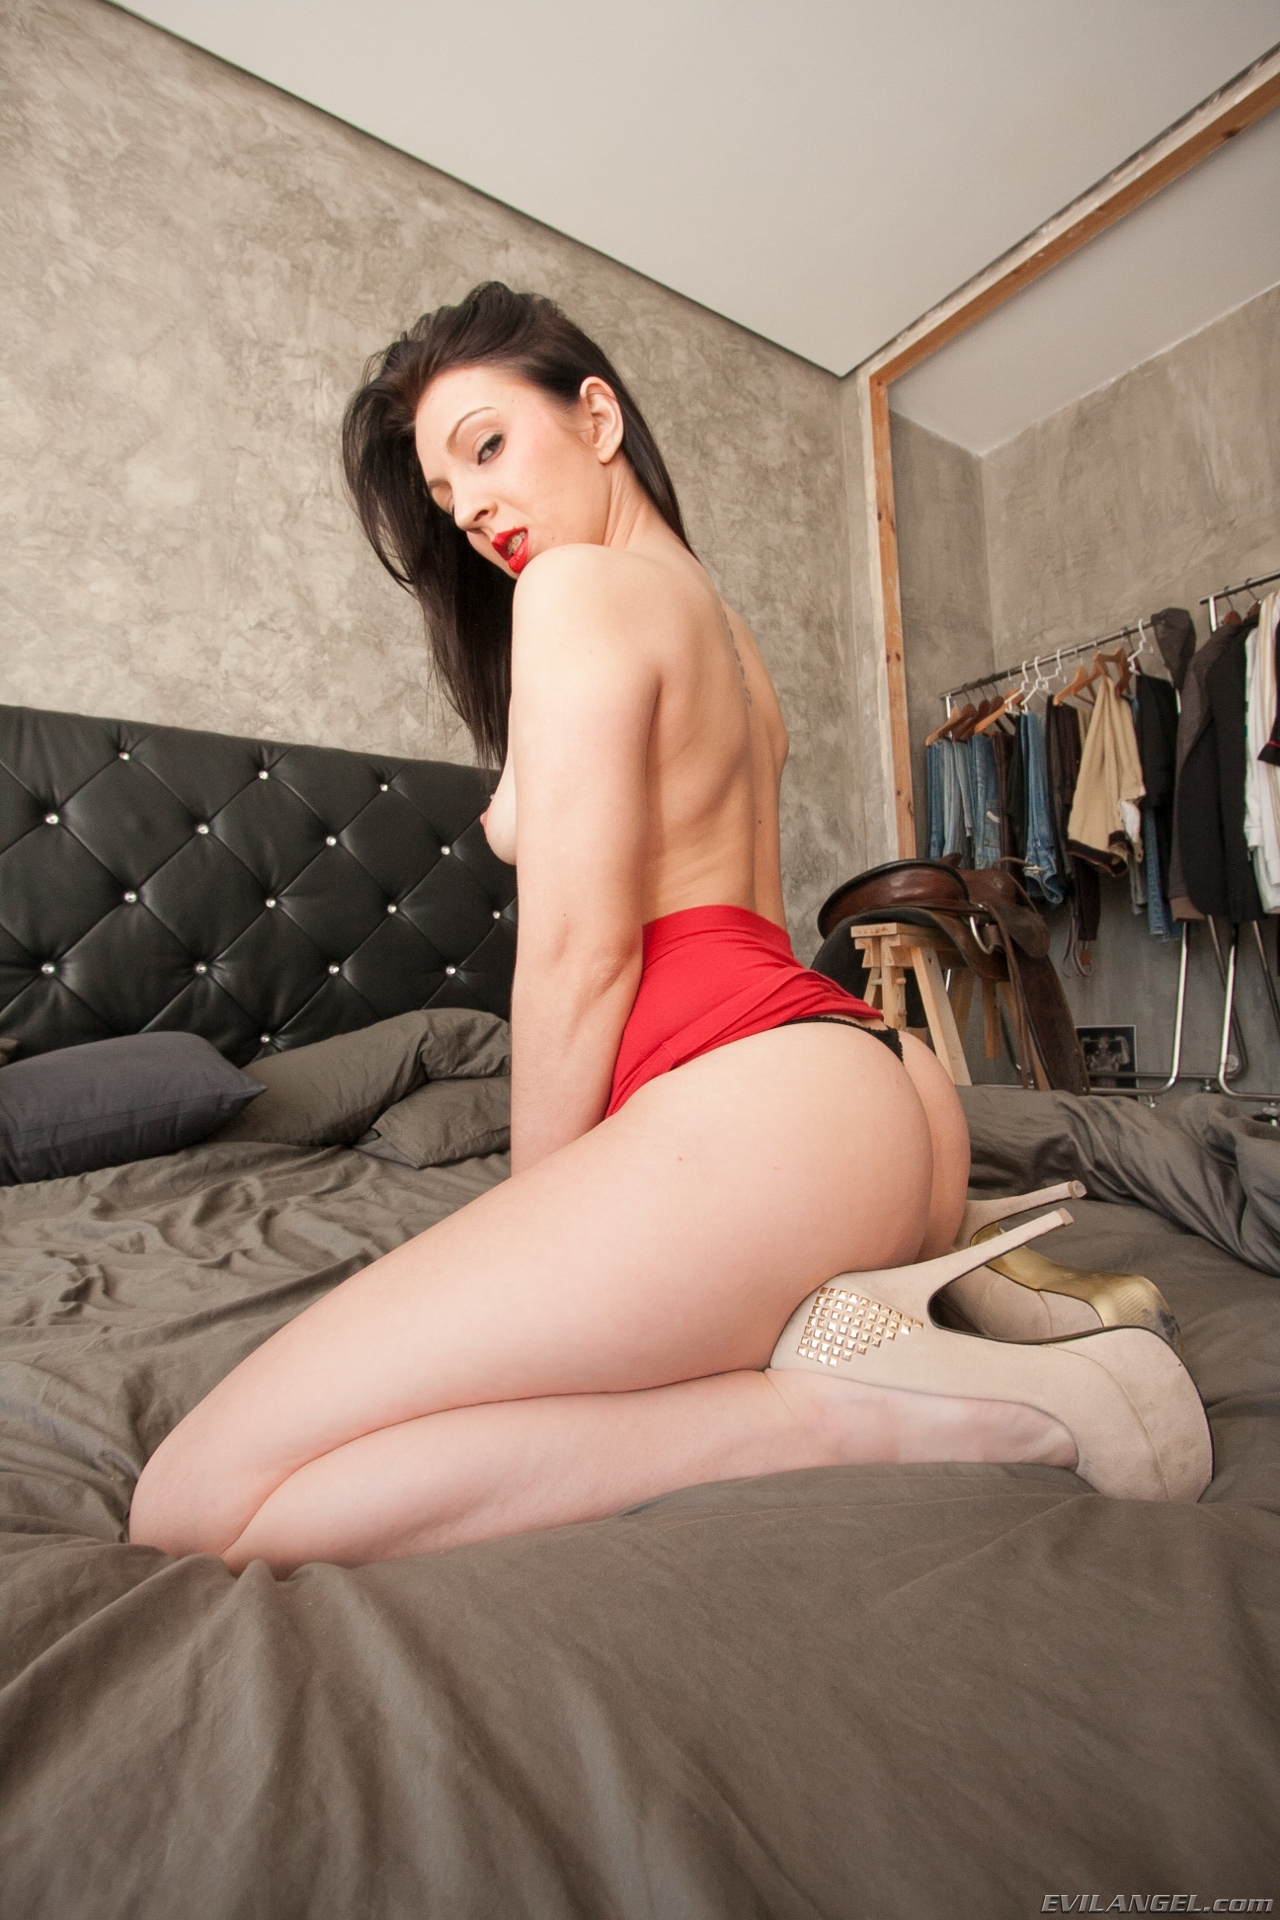 Pamela Sanchez Actriz Porno Scort evil angel nacho vidal & pamela sanchez 35981 - good sex porn